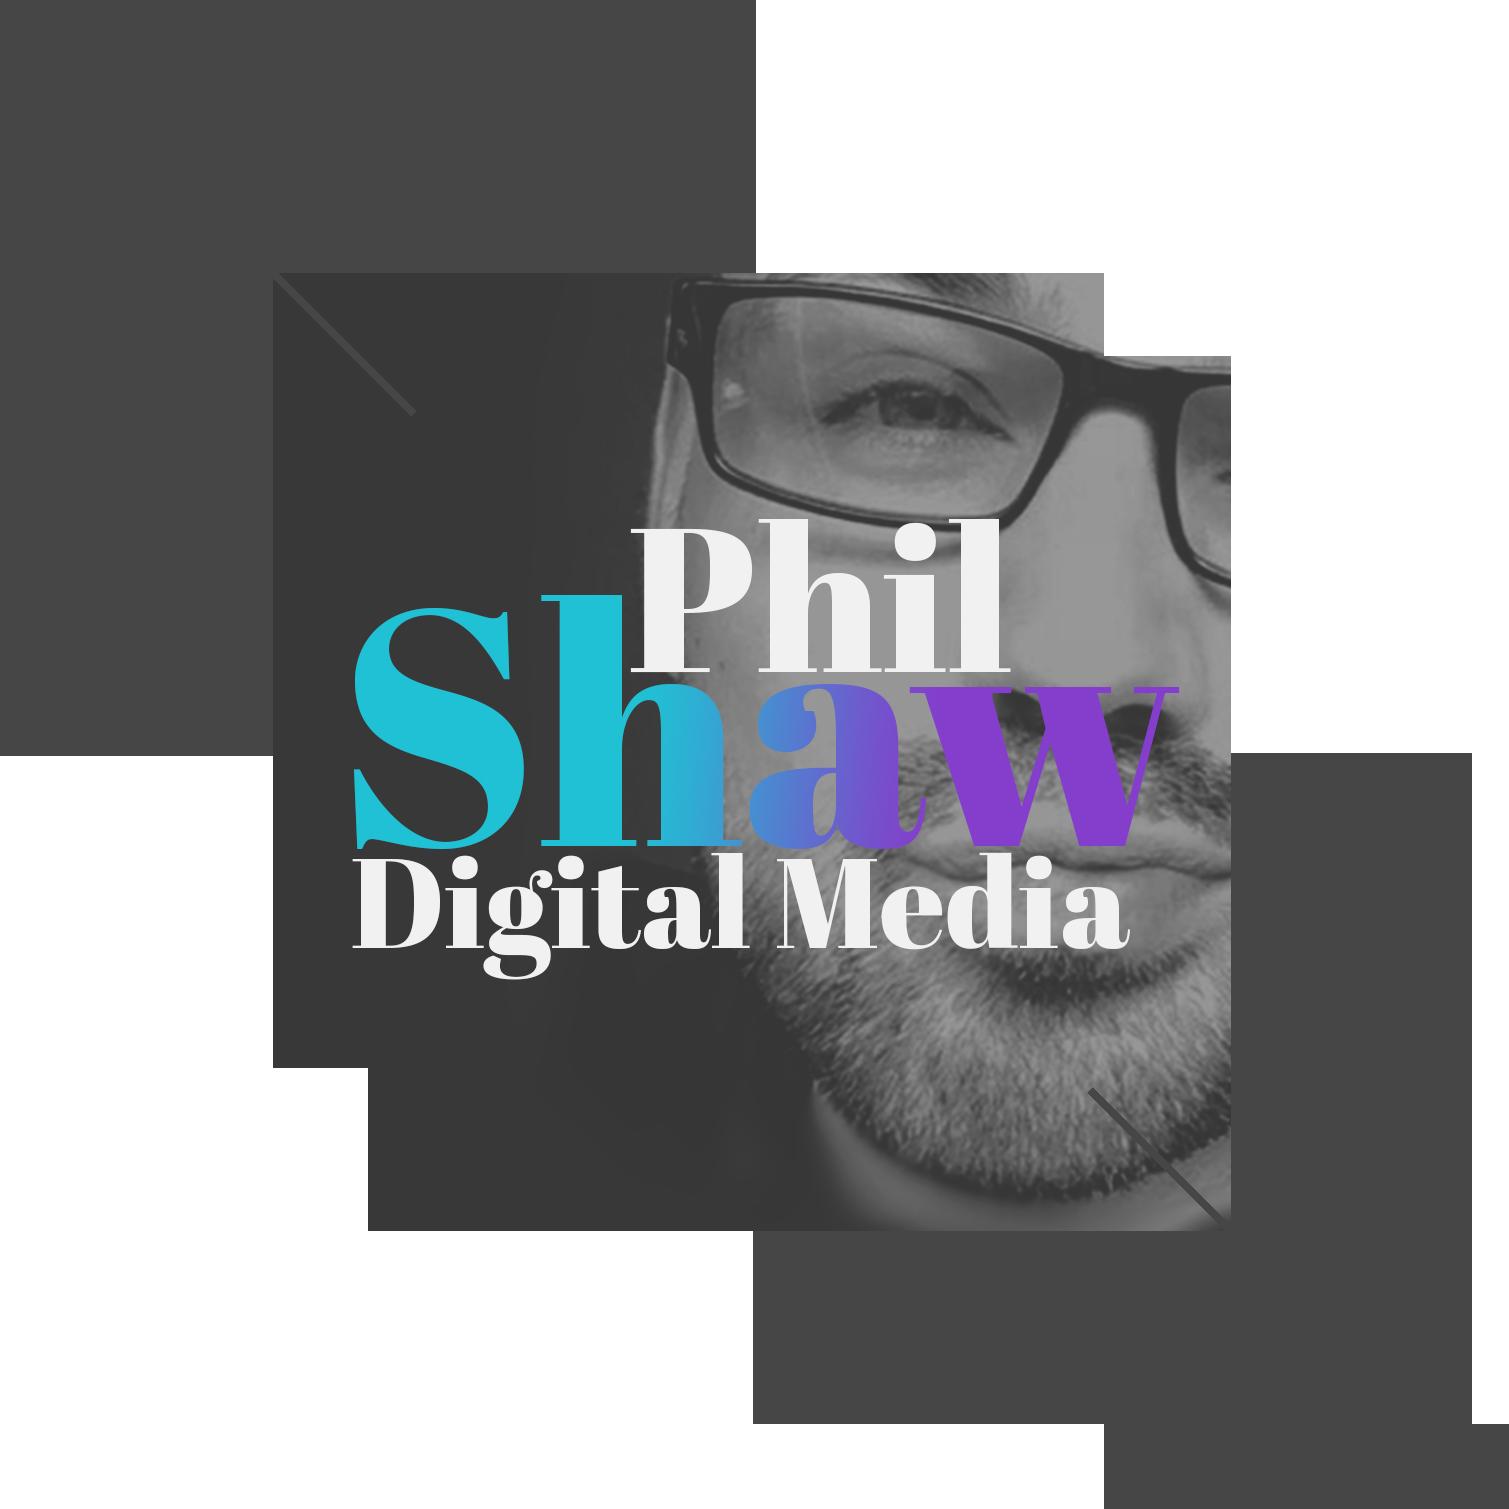 Phil Shaw Digital Media